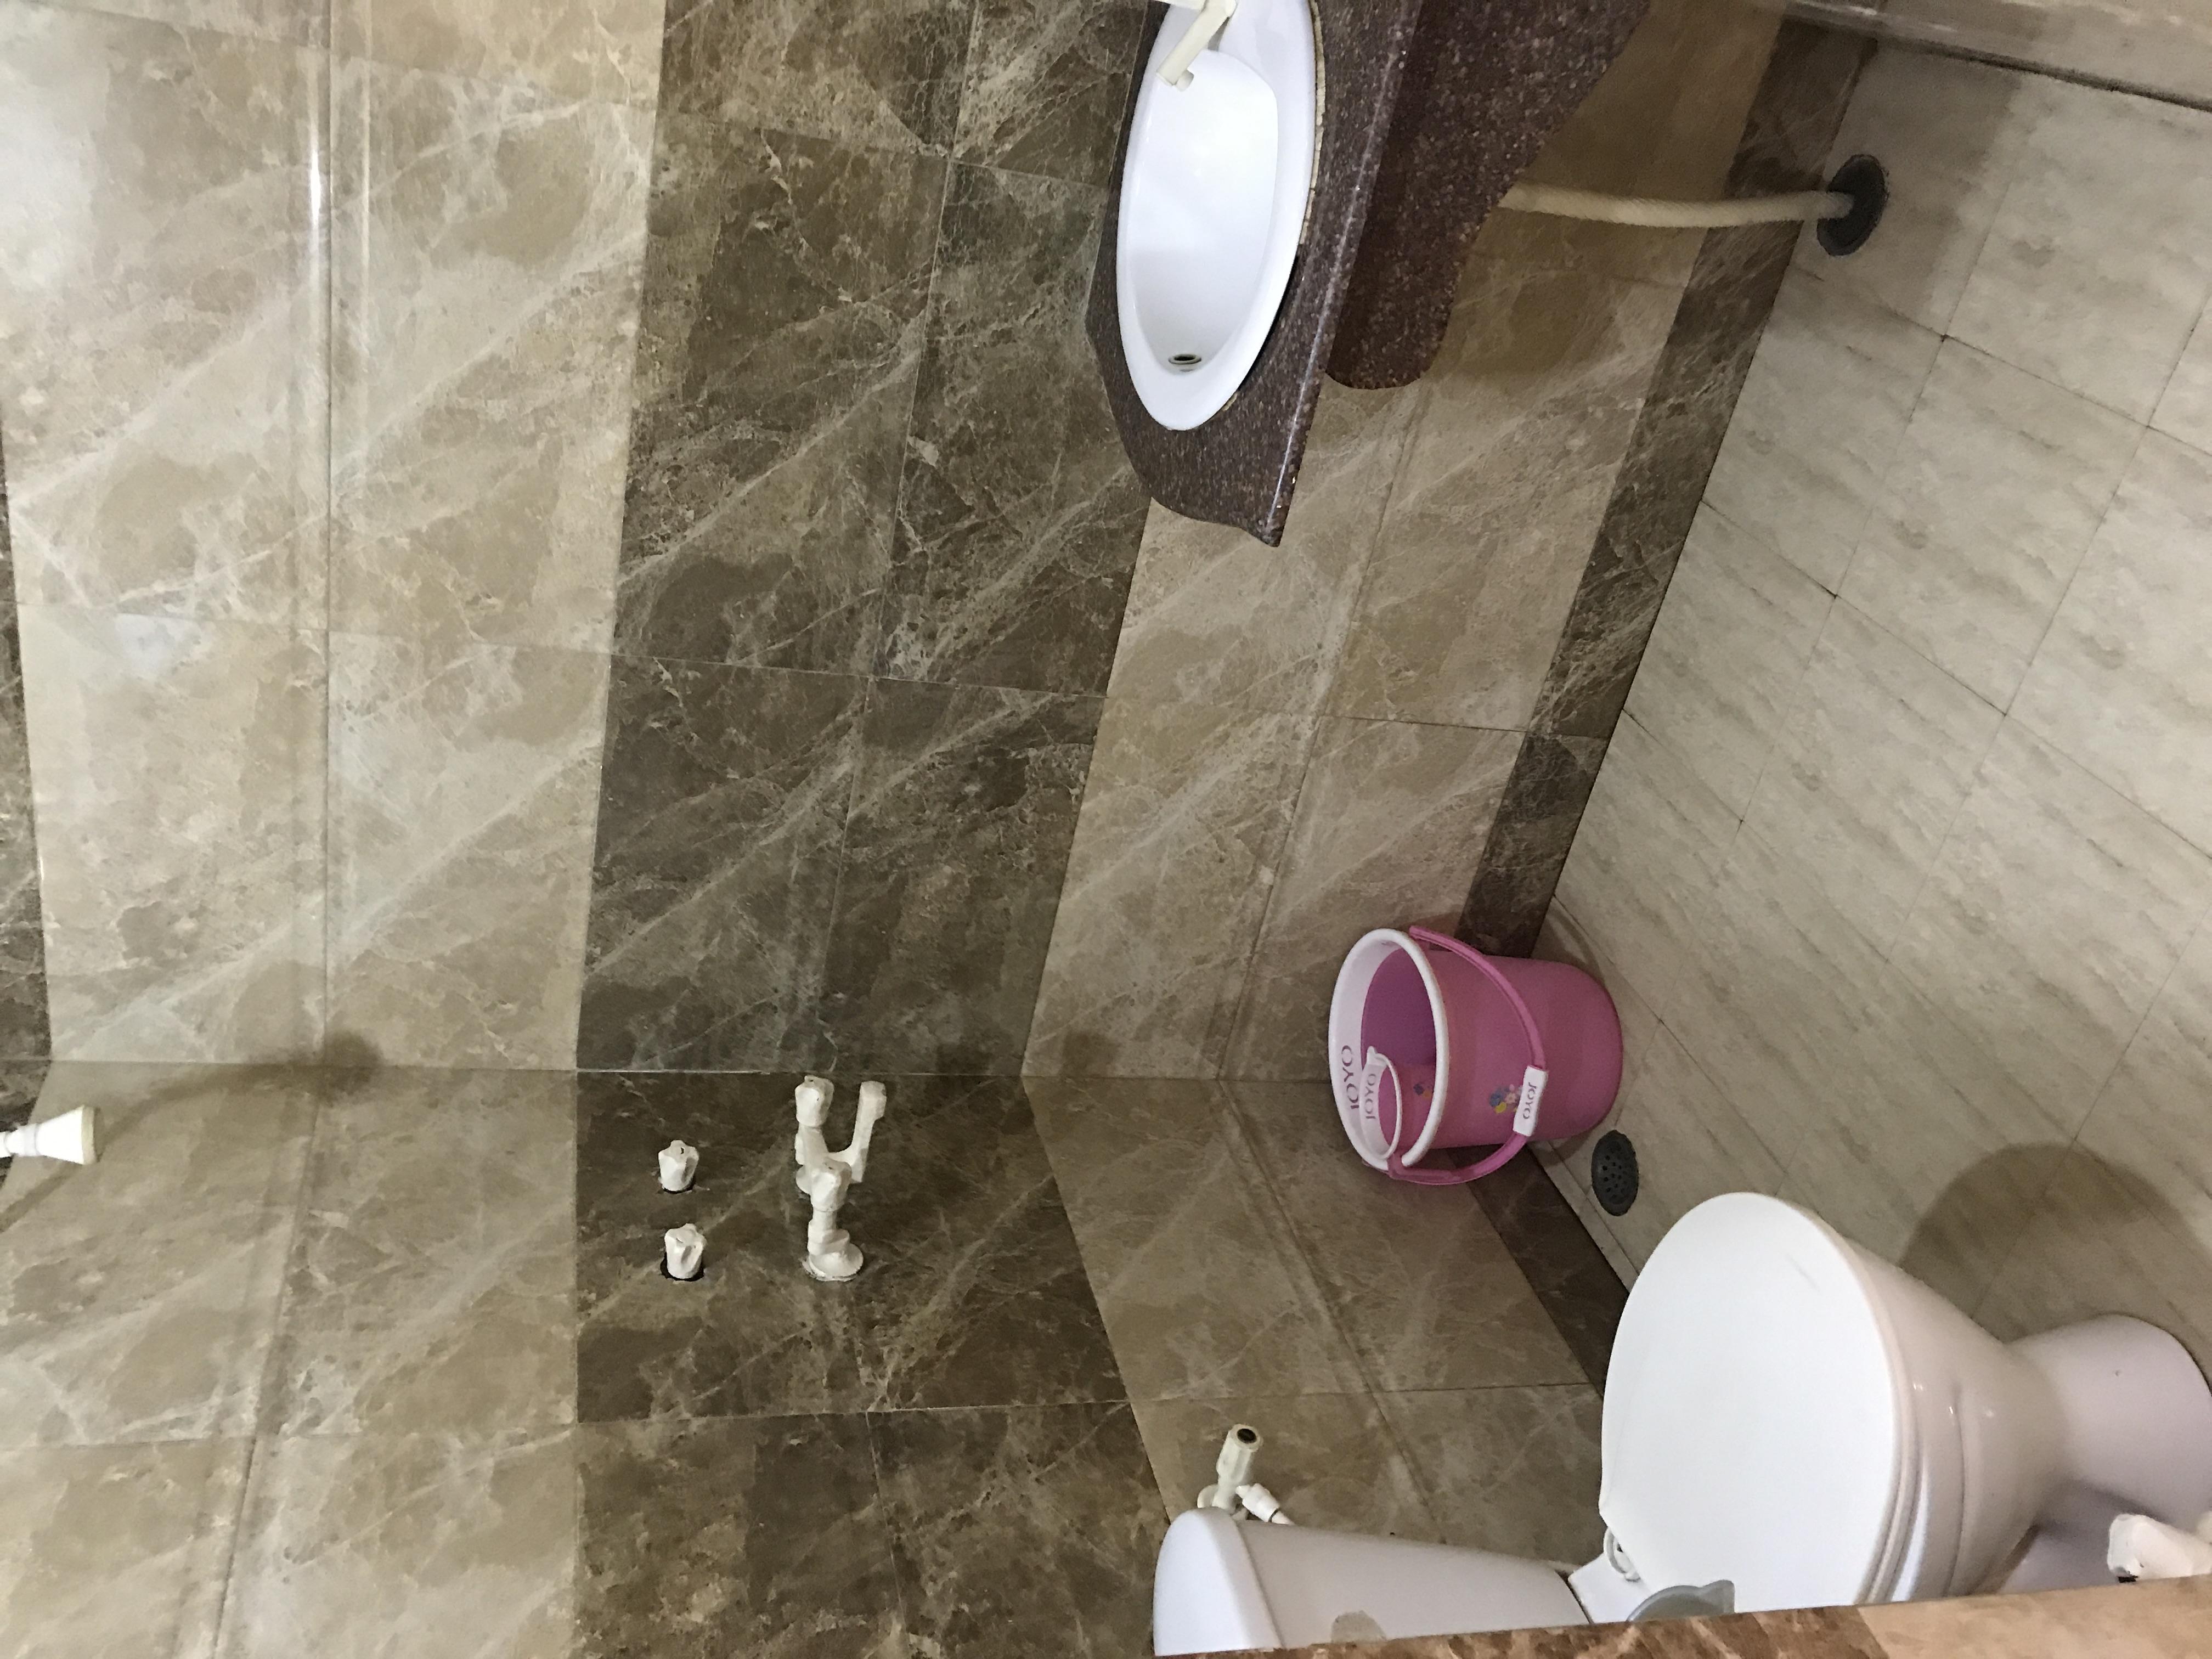 Standard AC Room, Hotel Sheela Agra - Budget Hotels in Agra